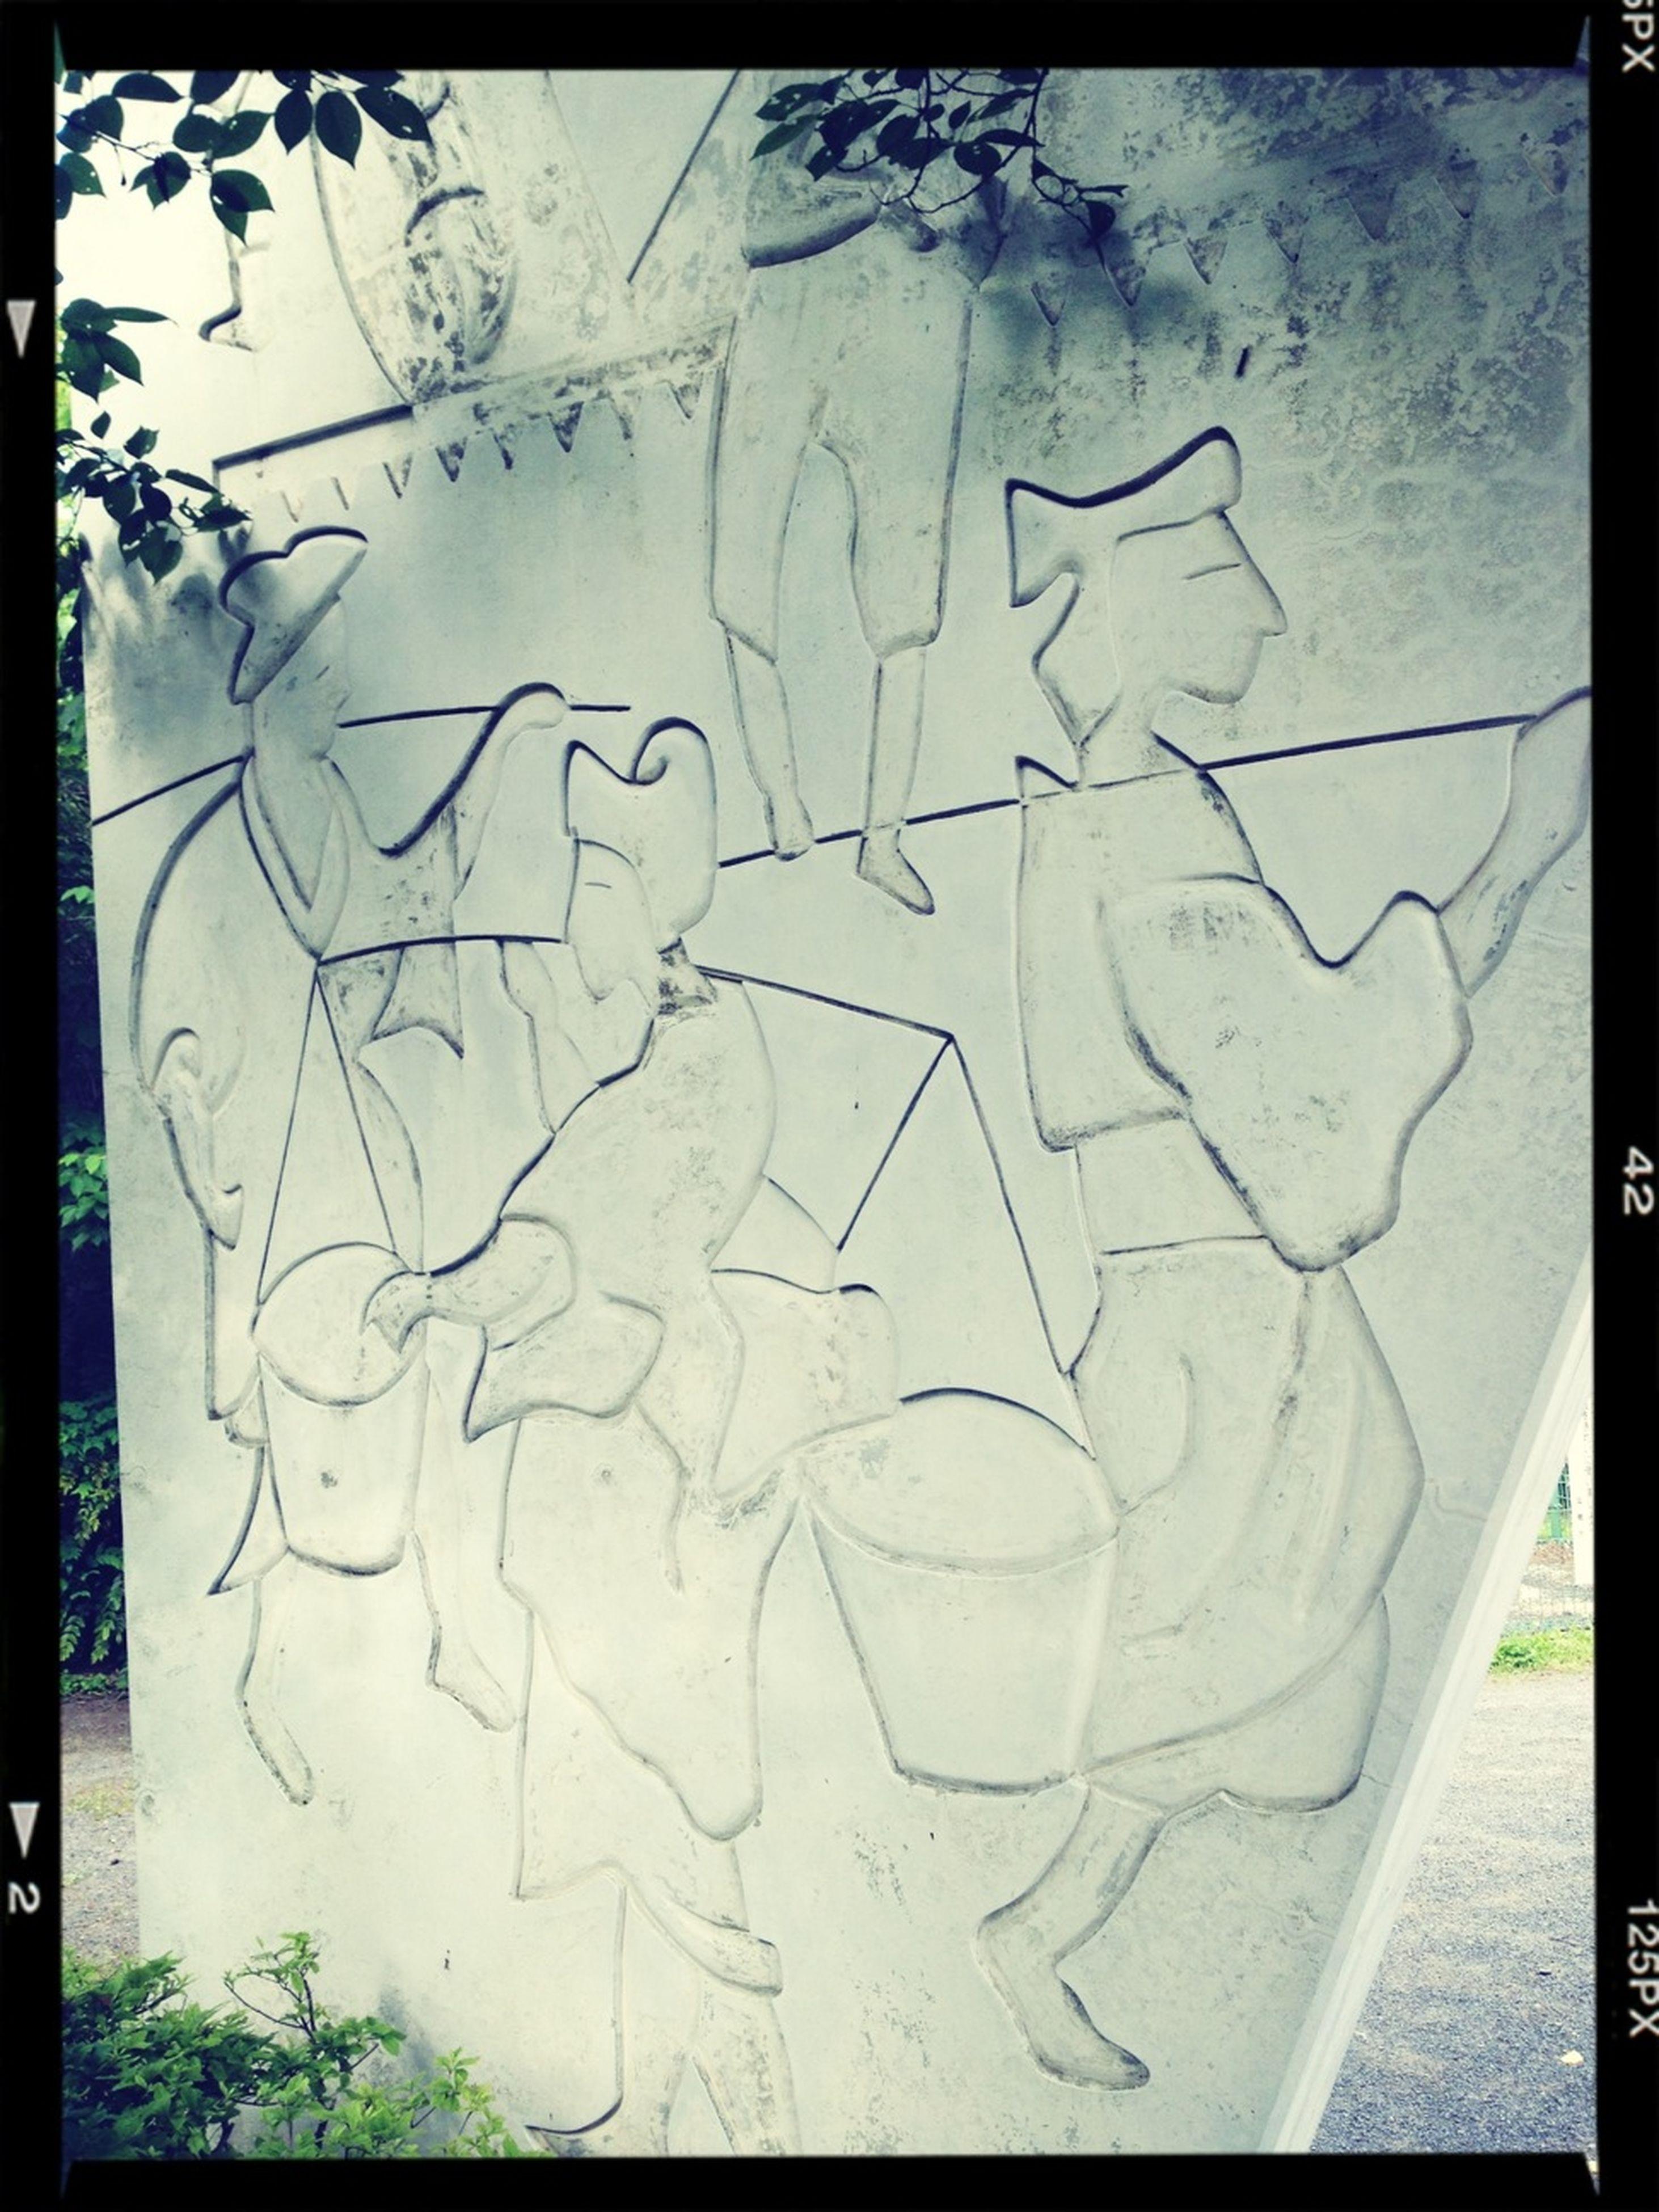 transfer print, auto post production filter, creativity, art, graffiti, art and craft, text, western script, wall - building feature, close-up, communication, wall, human representation, paint, day, heart shape, textured, ideas, outdoors, love